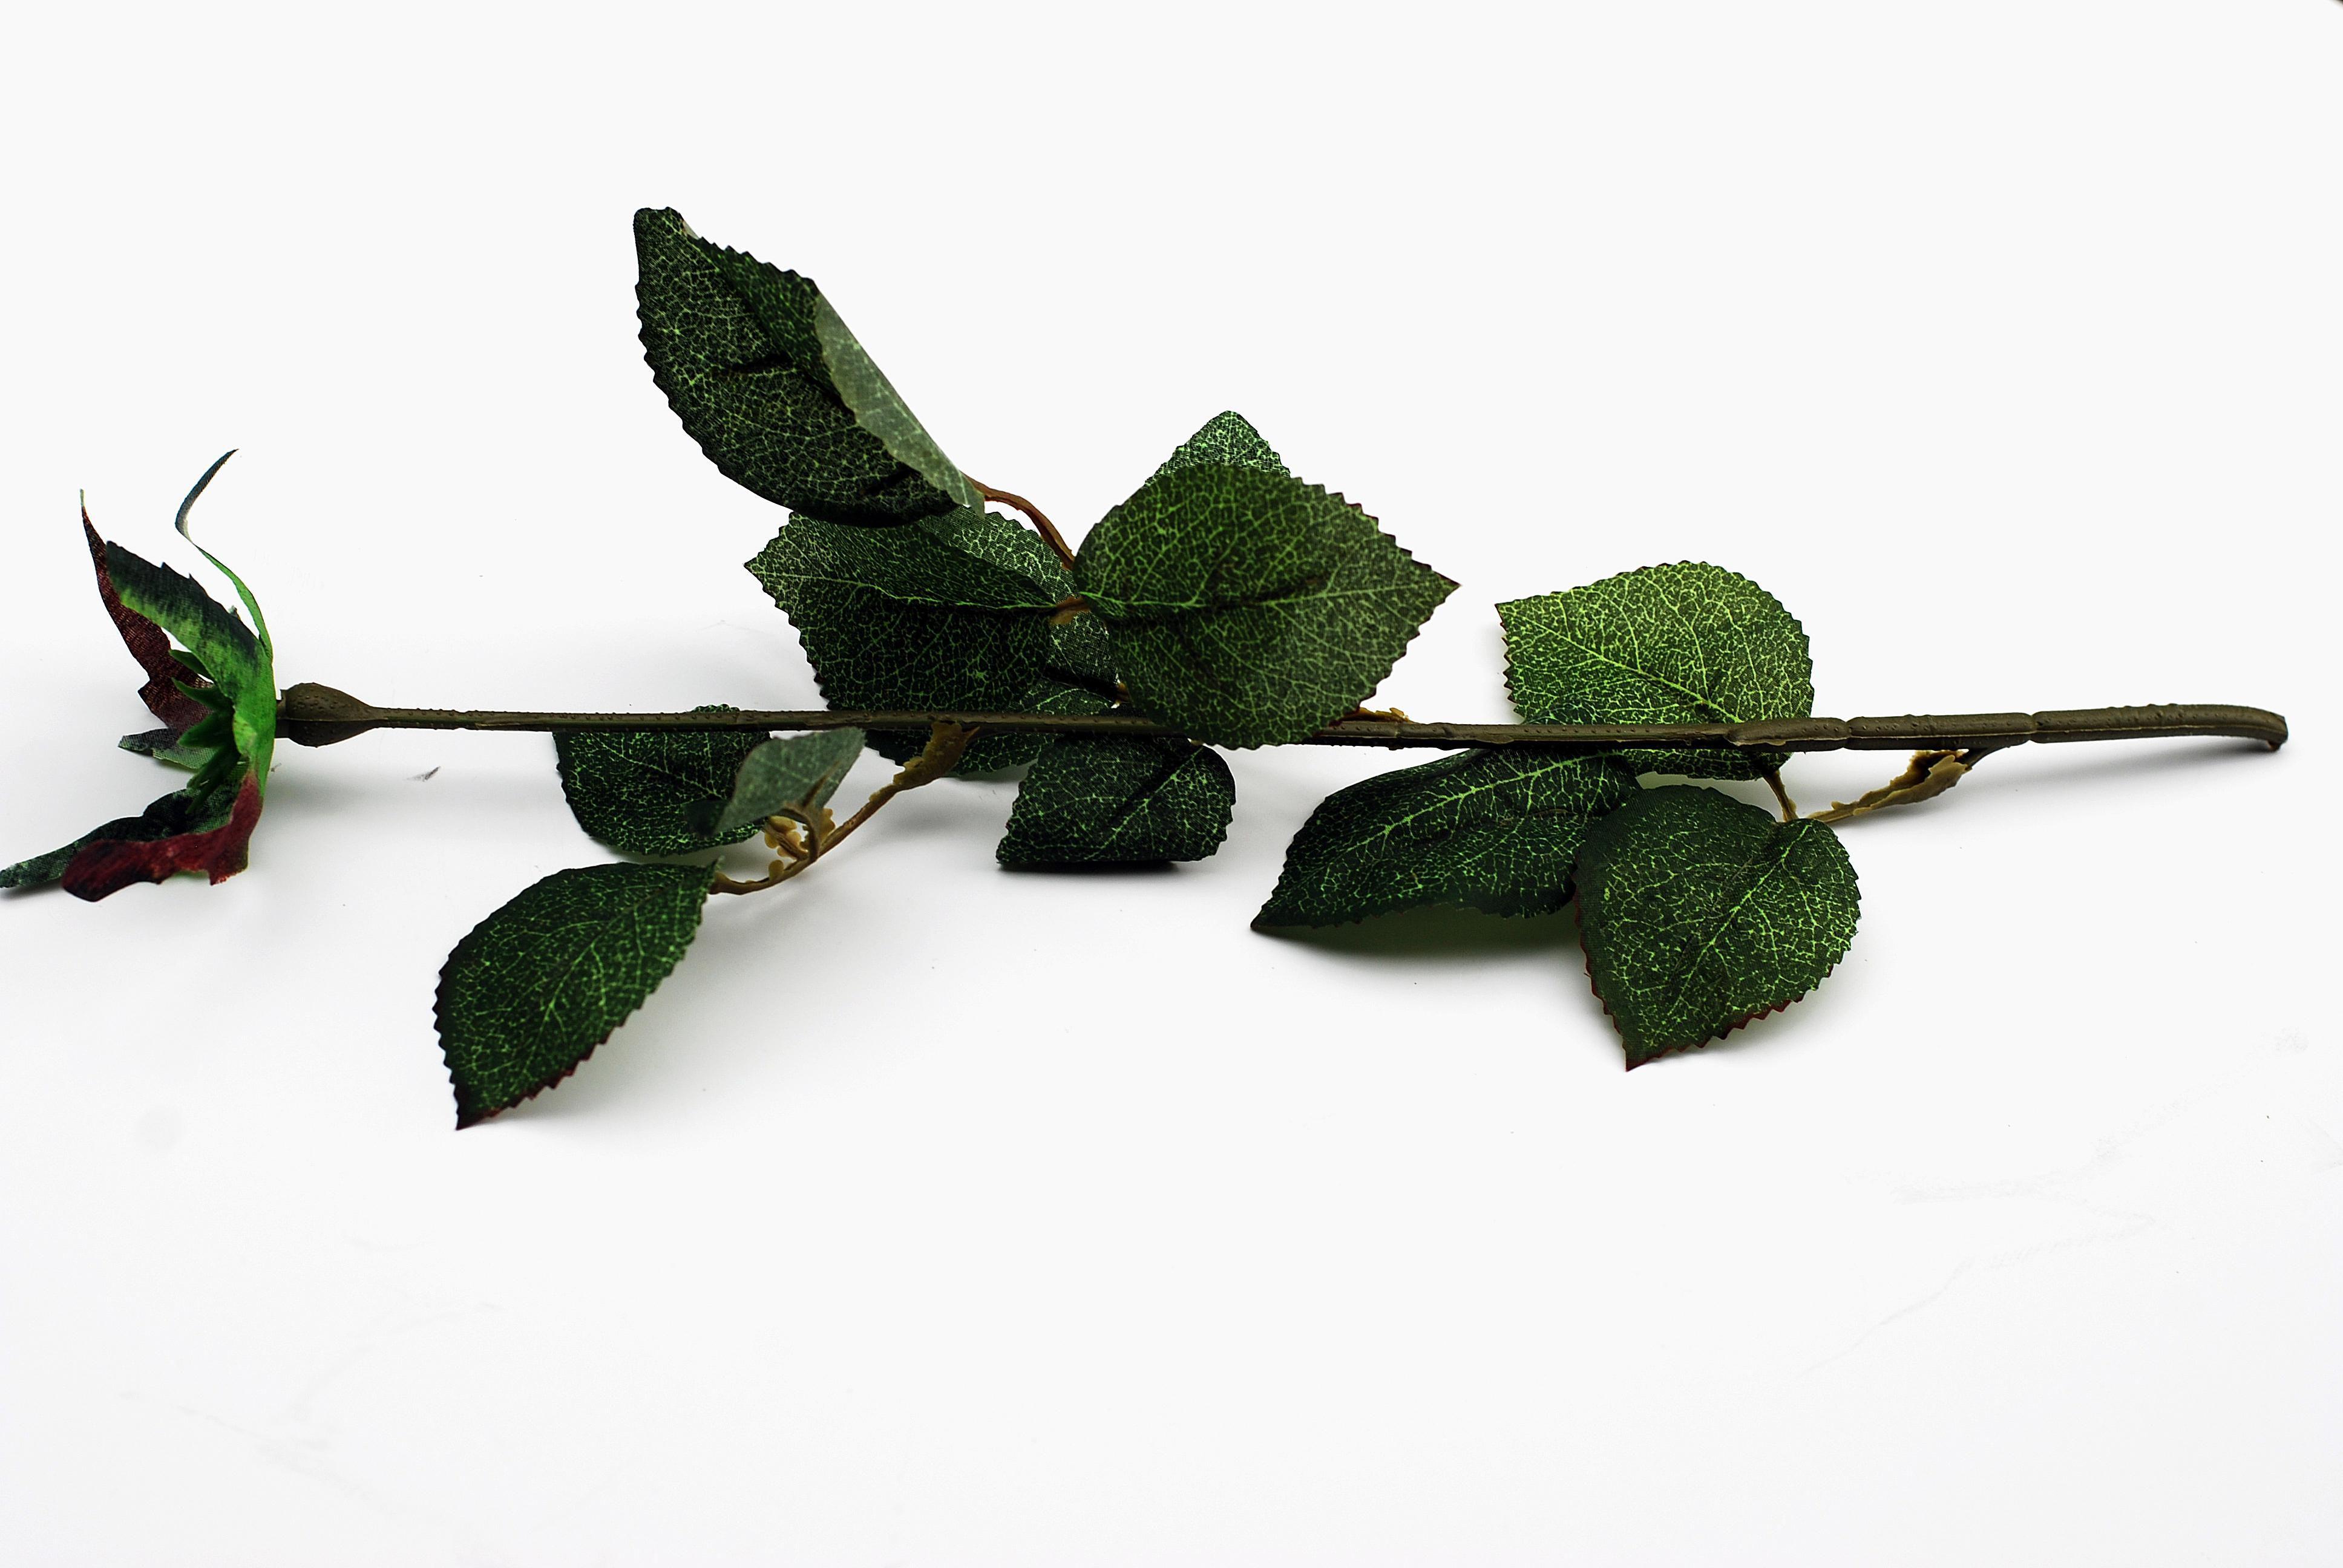 Silk rose stem and leaves